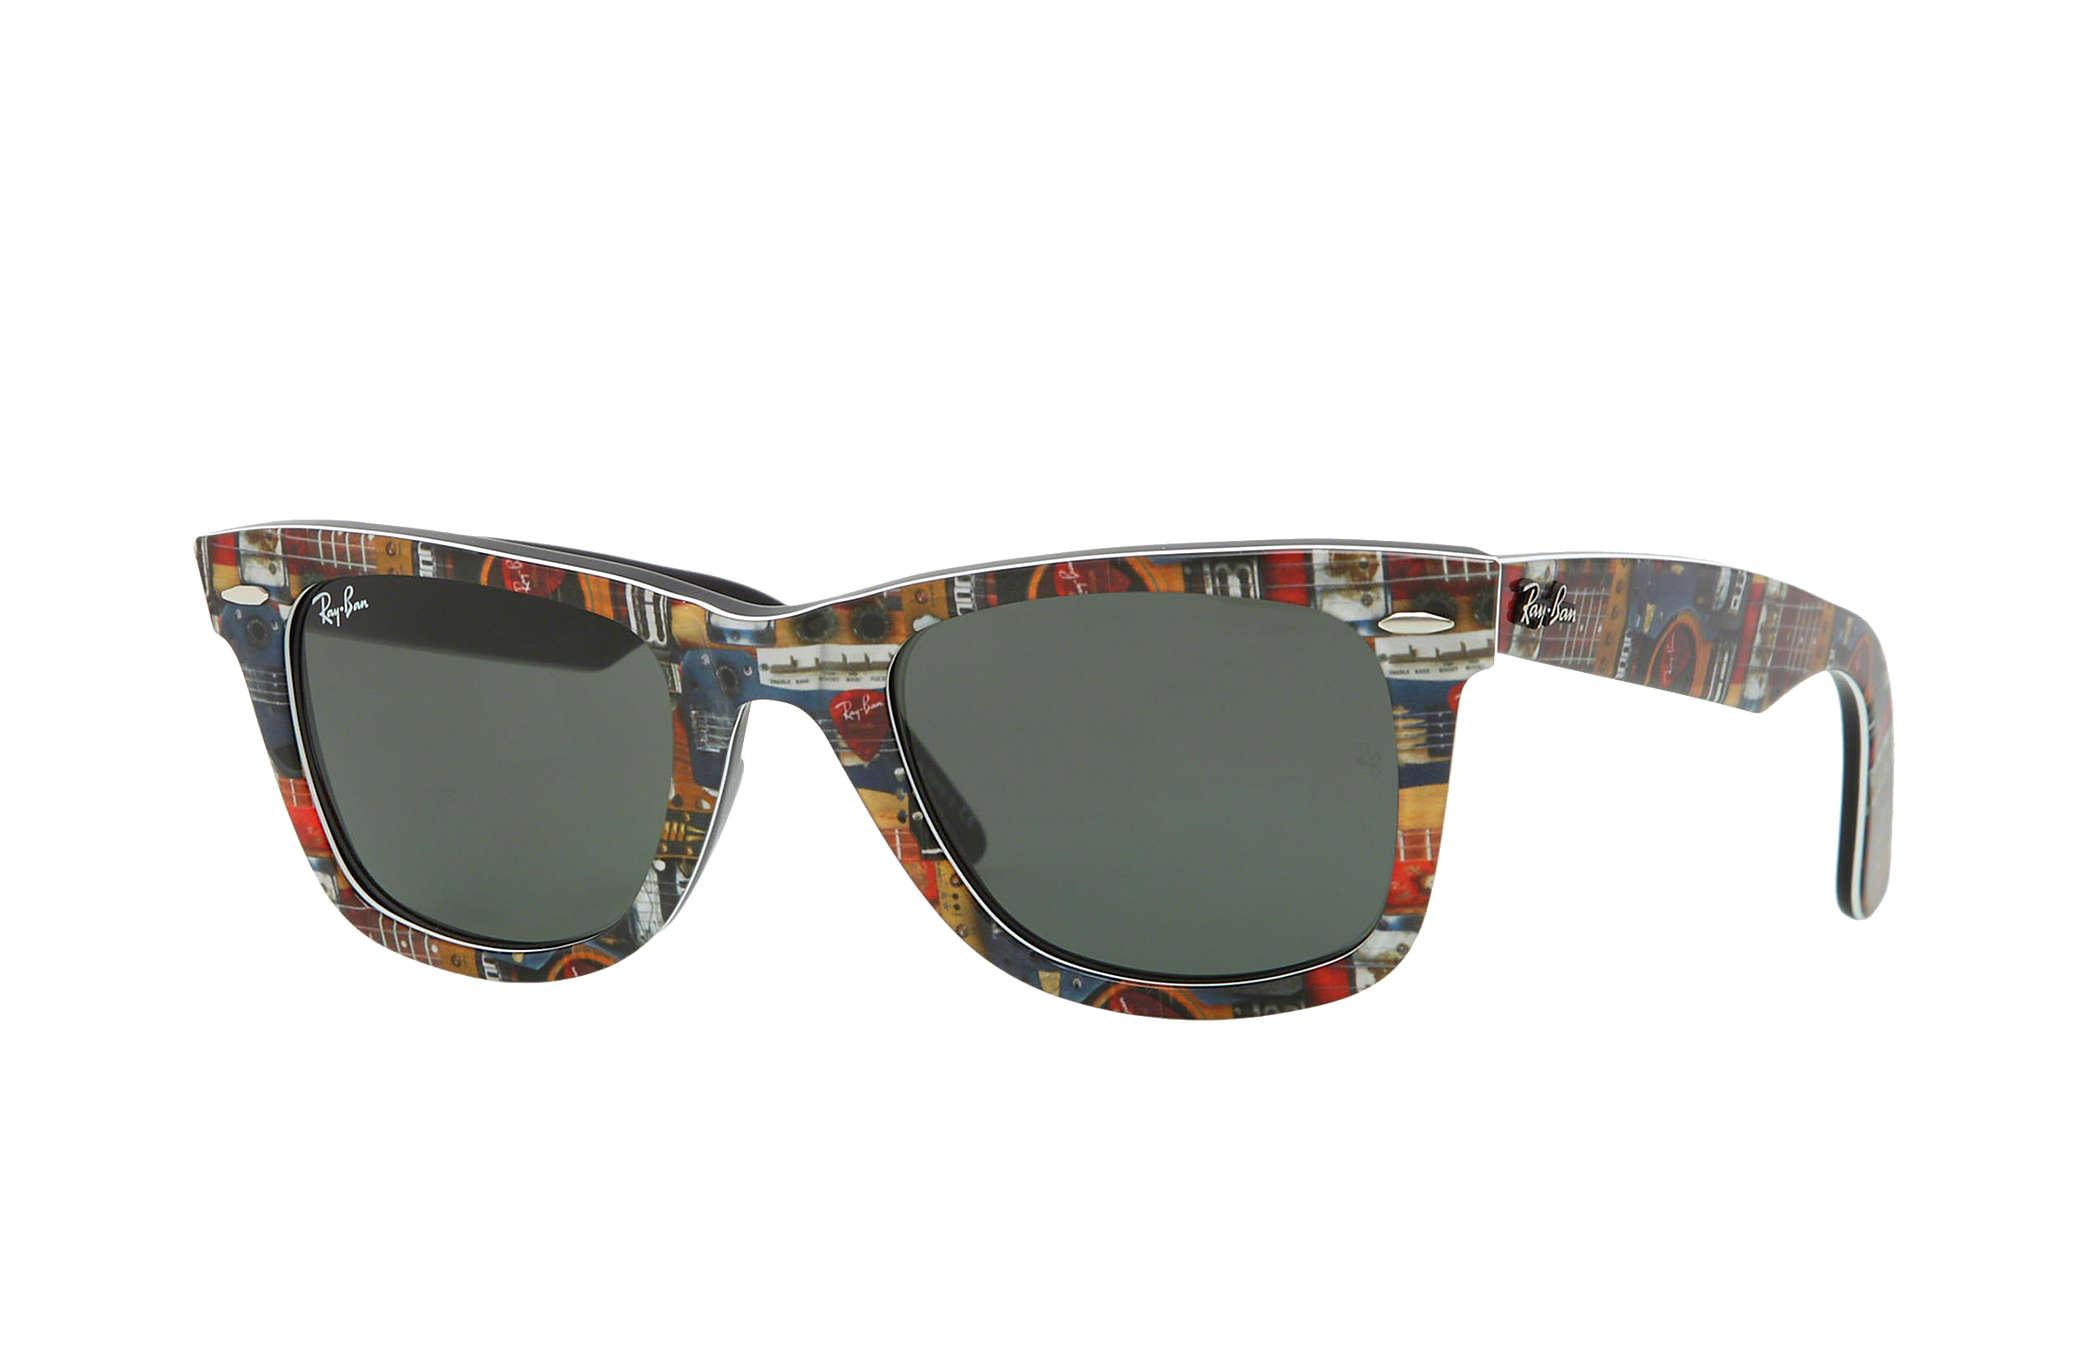 Ray ban sunglasses new design - Ray Ban 0rb2140 Original Wayfarer Rare Prints Multicolor Black Sun